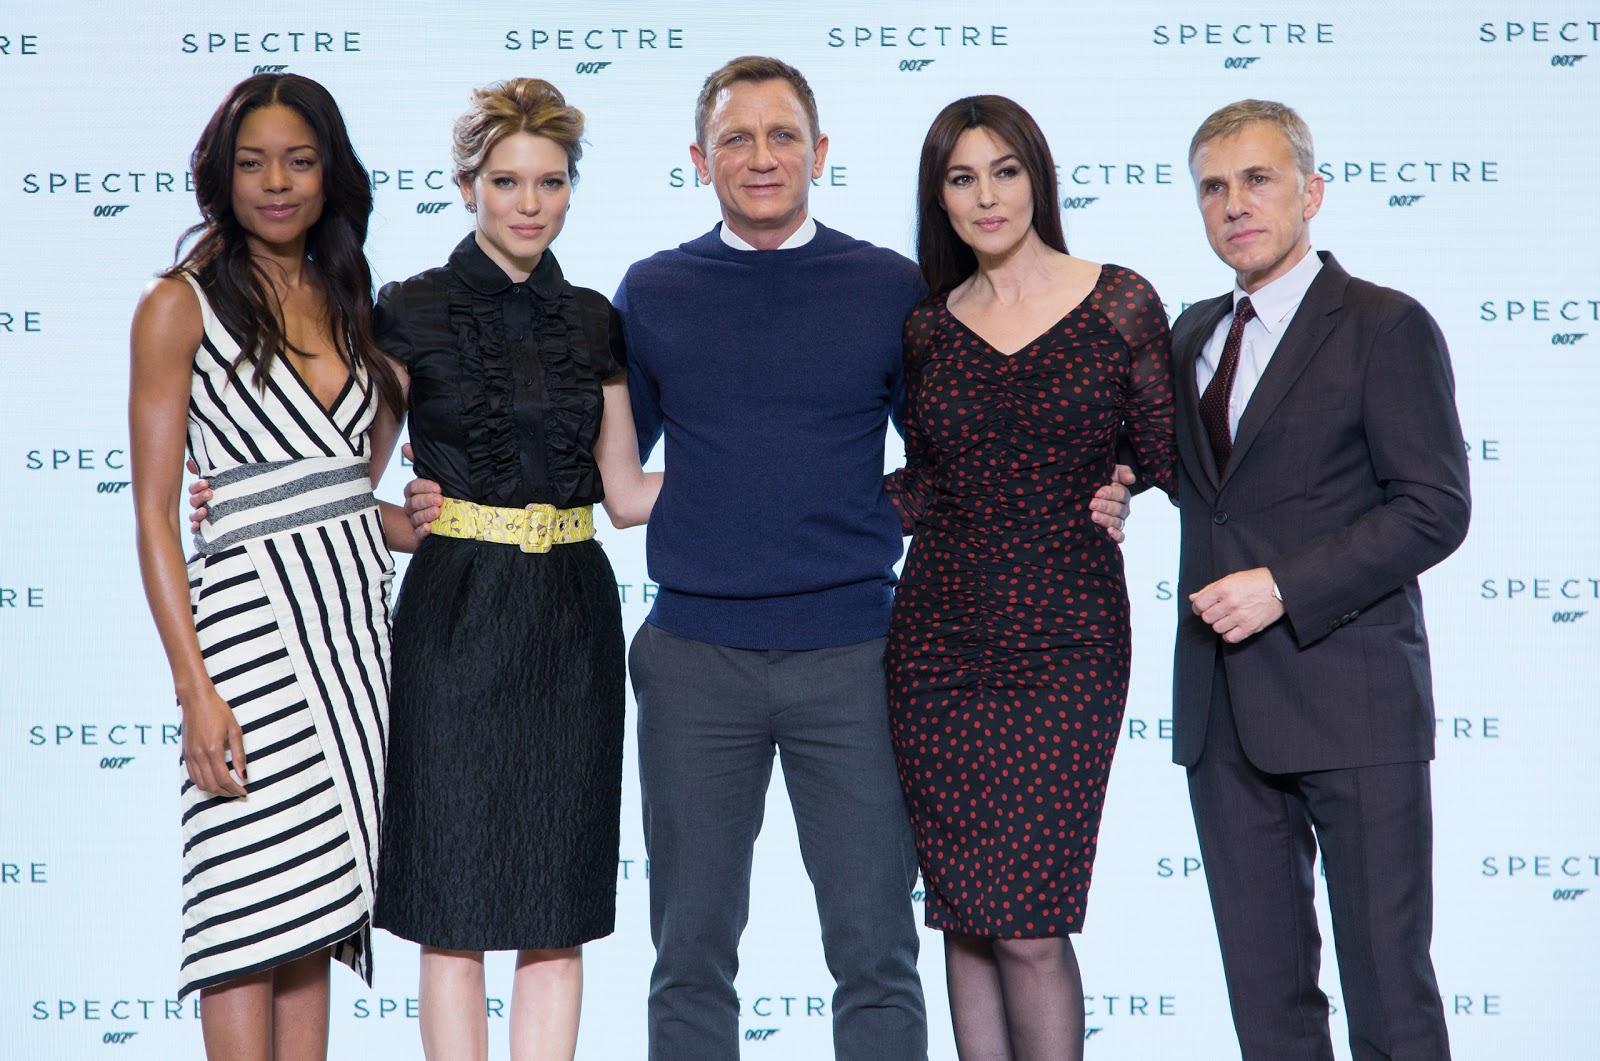 SPECTRE Naomie Harris, Léa Seydoux, Daniel Craig, Monica Bellucci, Christoph Waltz.